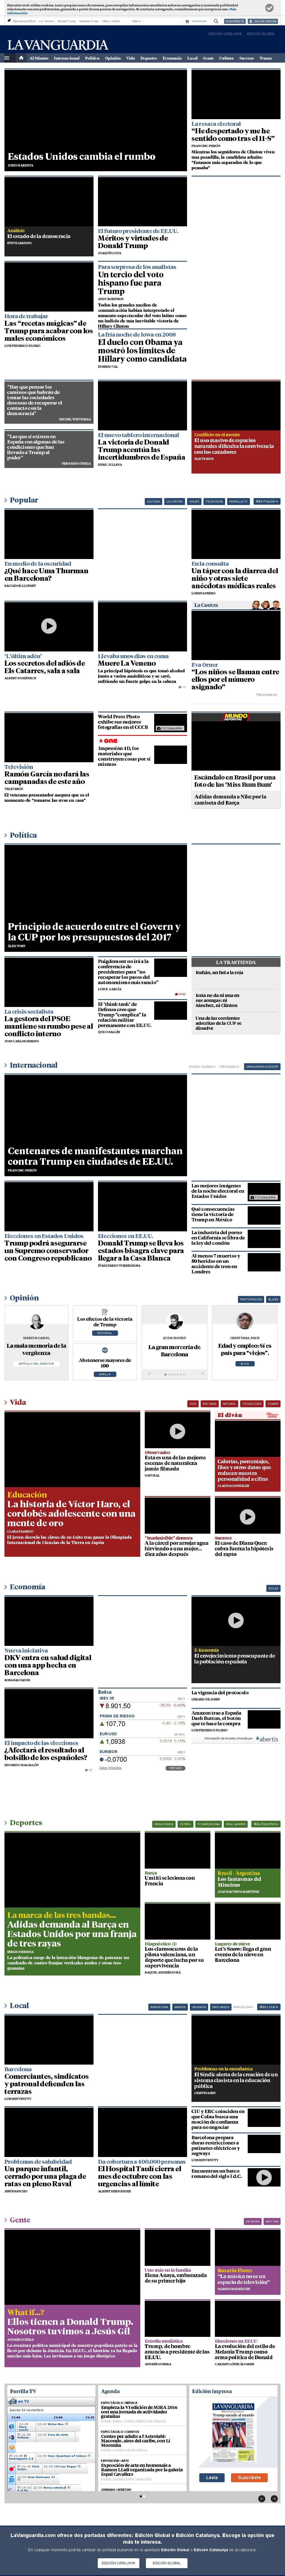 La Vanguardia at Thursday Nov. 10, 2016, 3:22 a.m. UTC